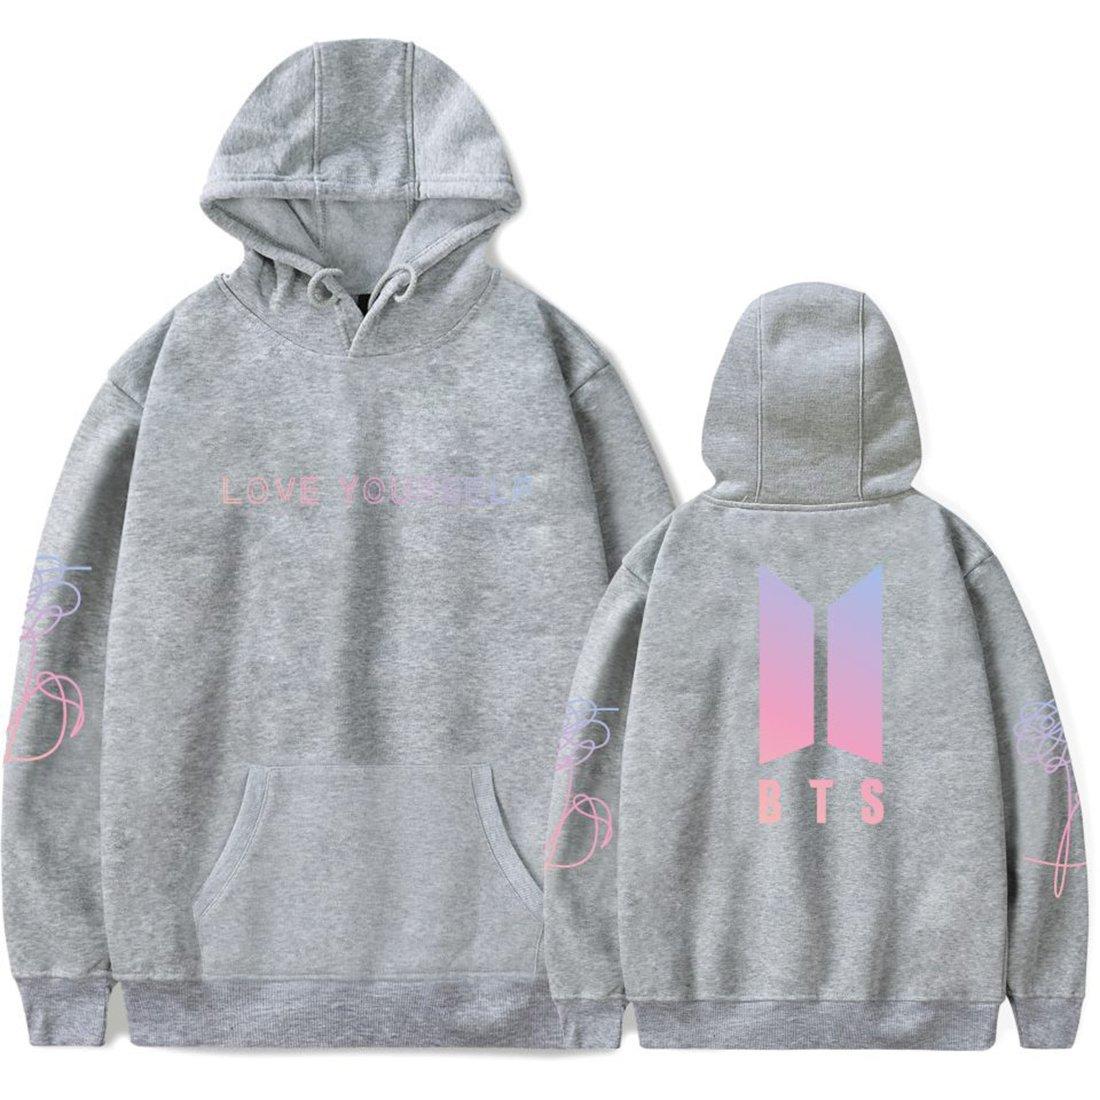 EMILYLE Donna Love Yourself Felpa con Cappuccio Bangtan Boys BTS KPOP Fans Unisex Hoodie Moda Sportiva Sweatshirt